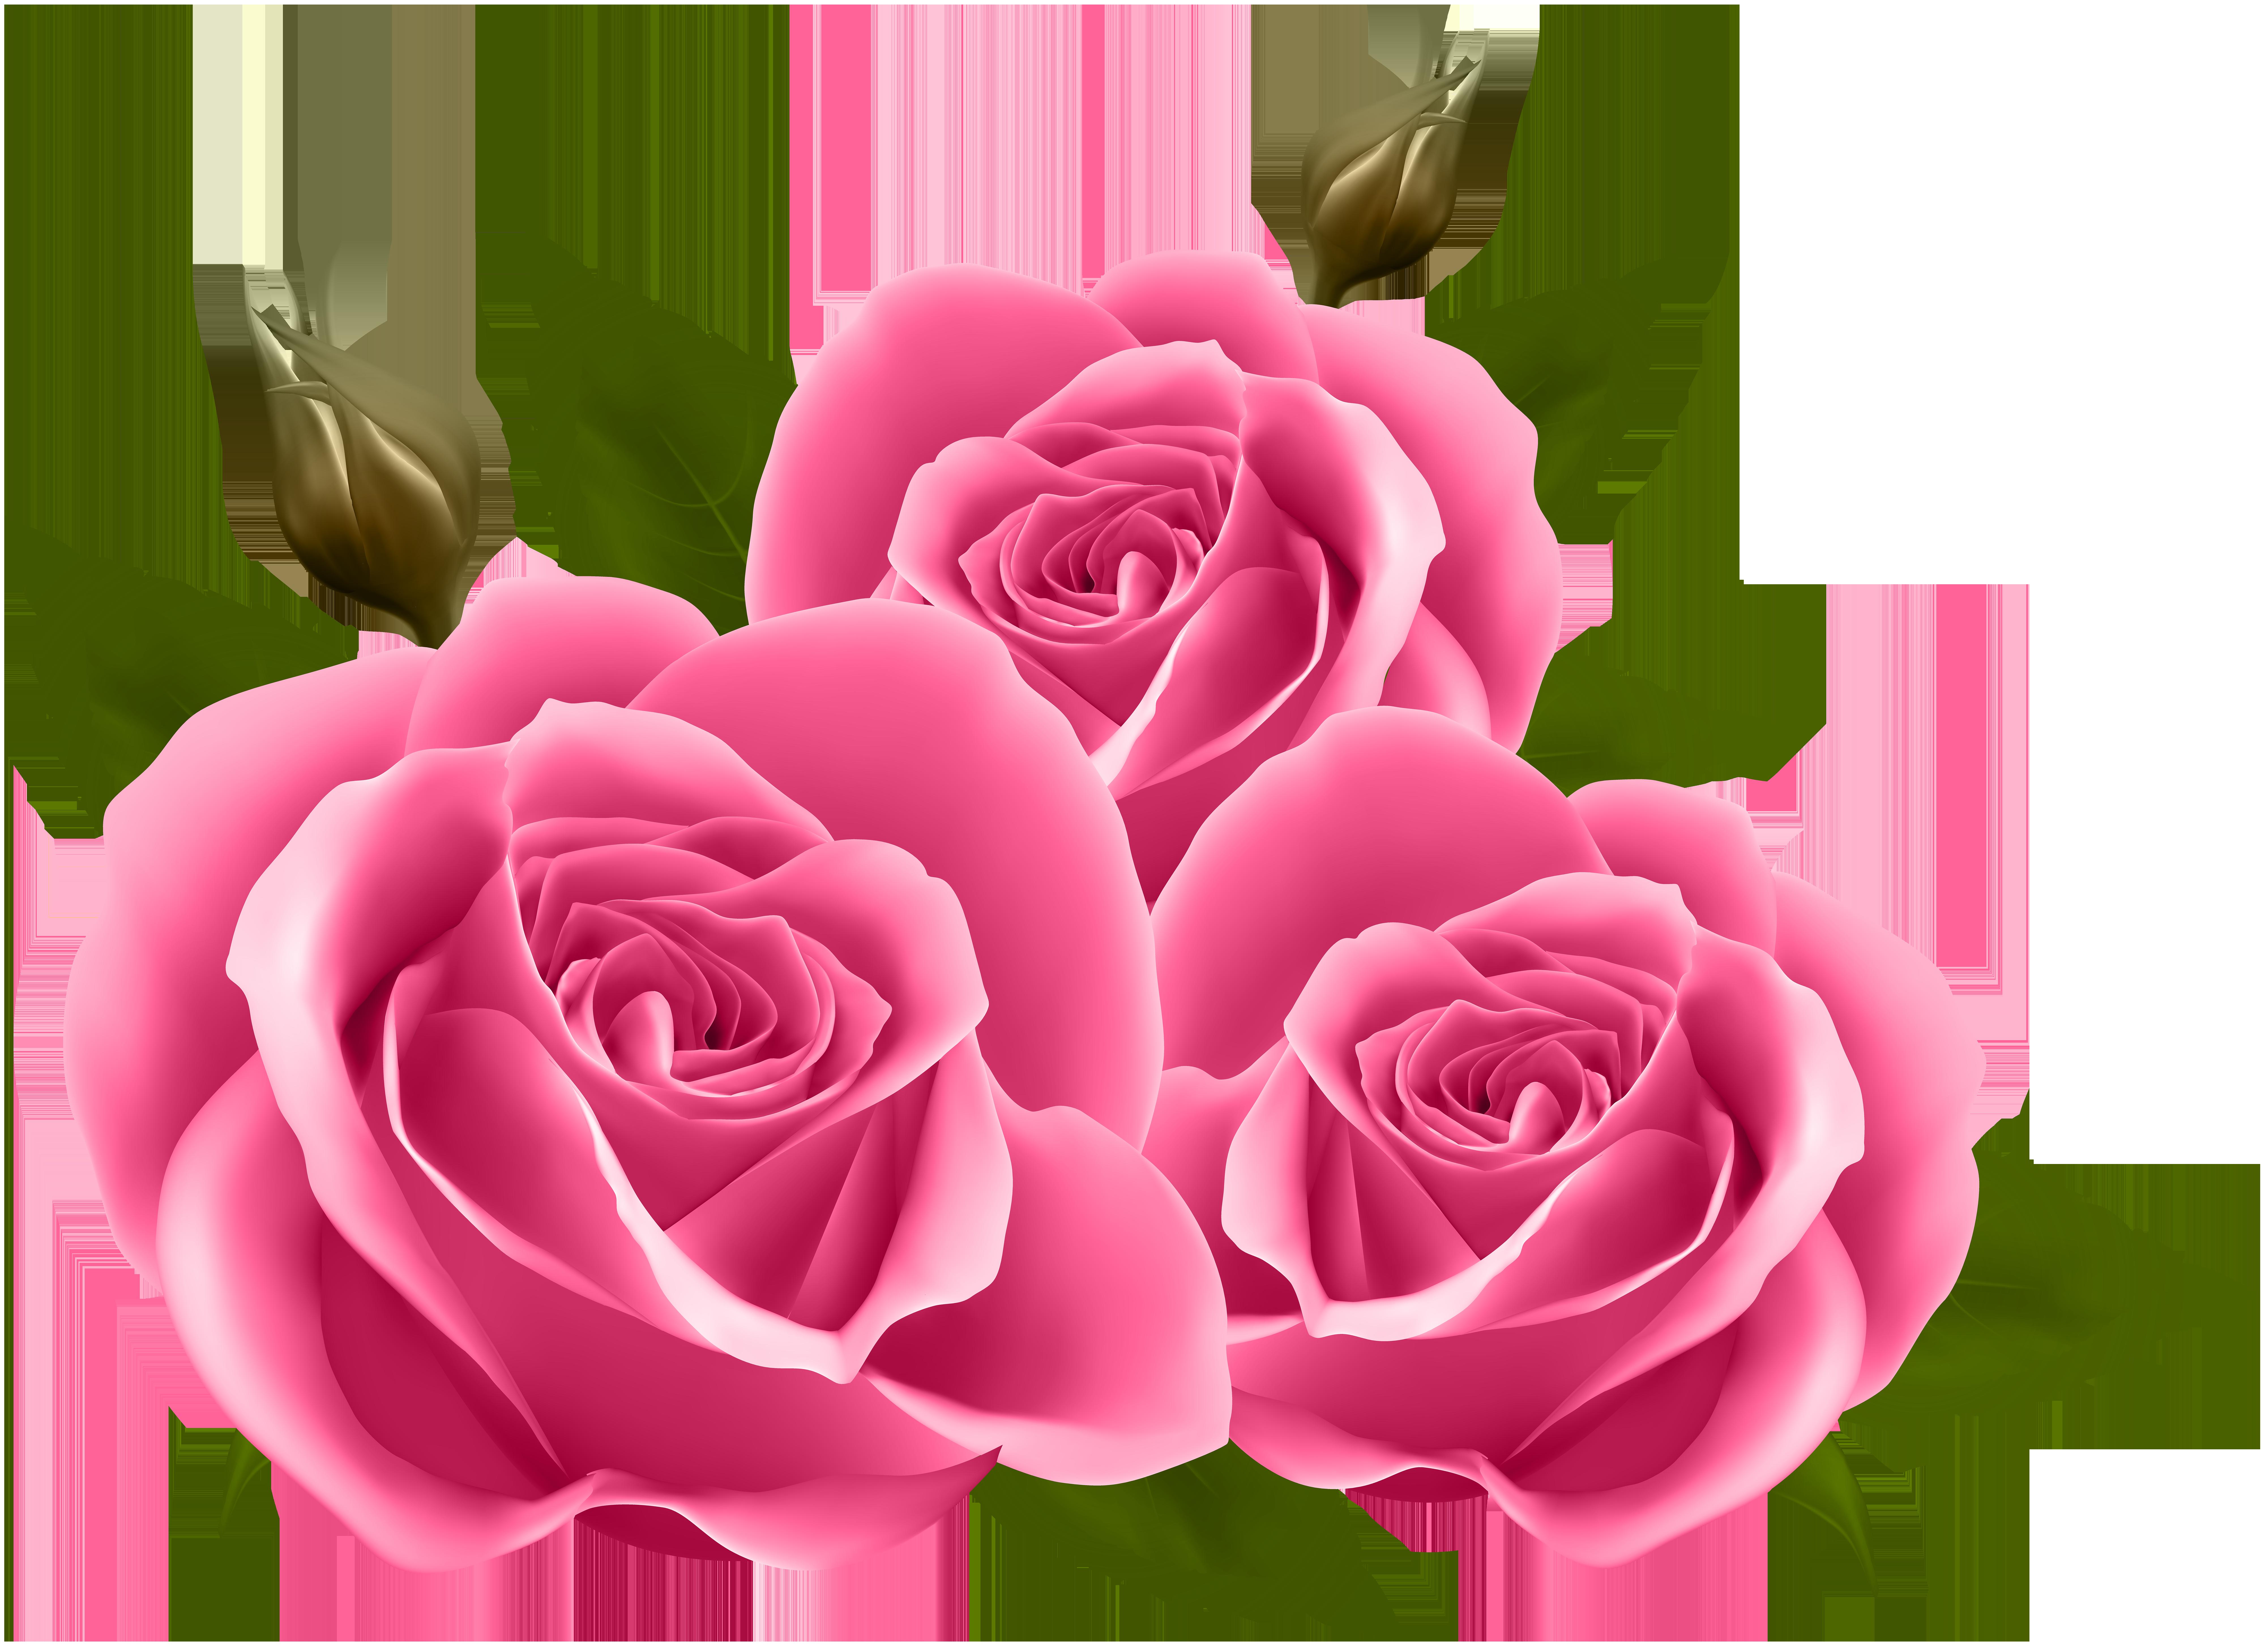 Pink Roses PNG Clip Art Image.